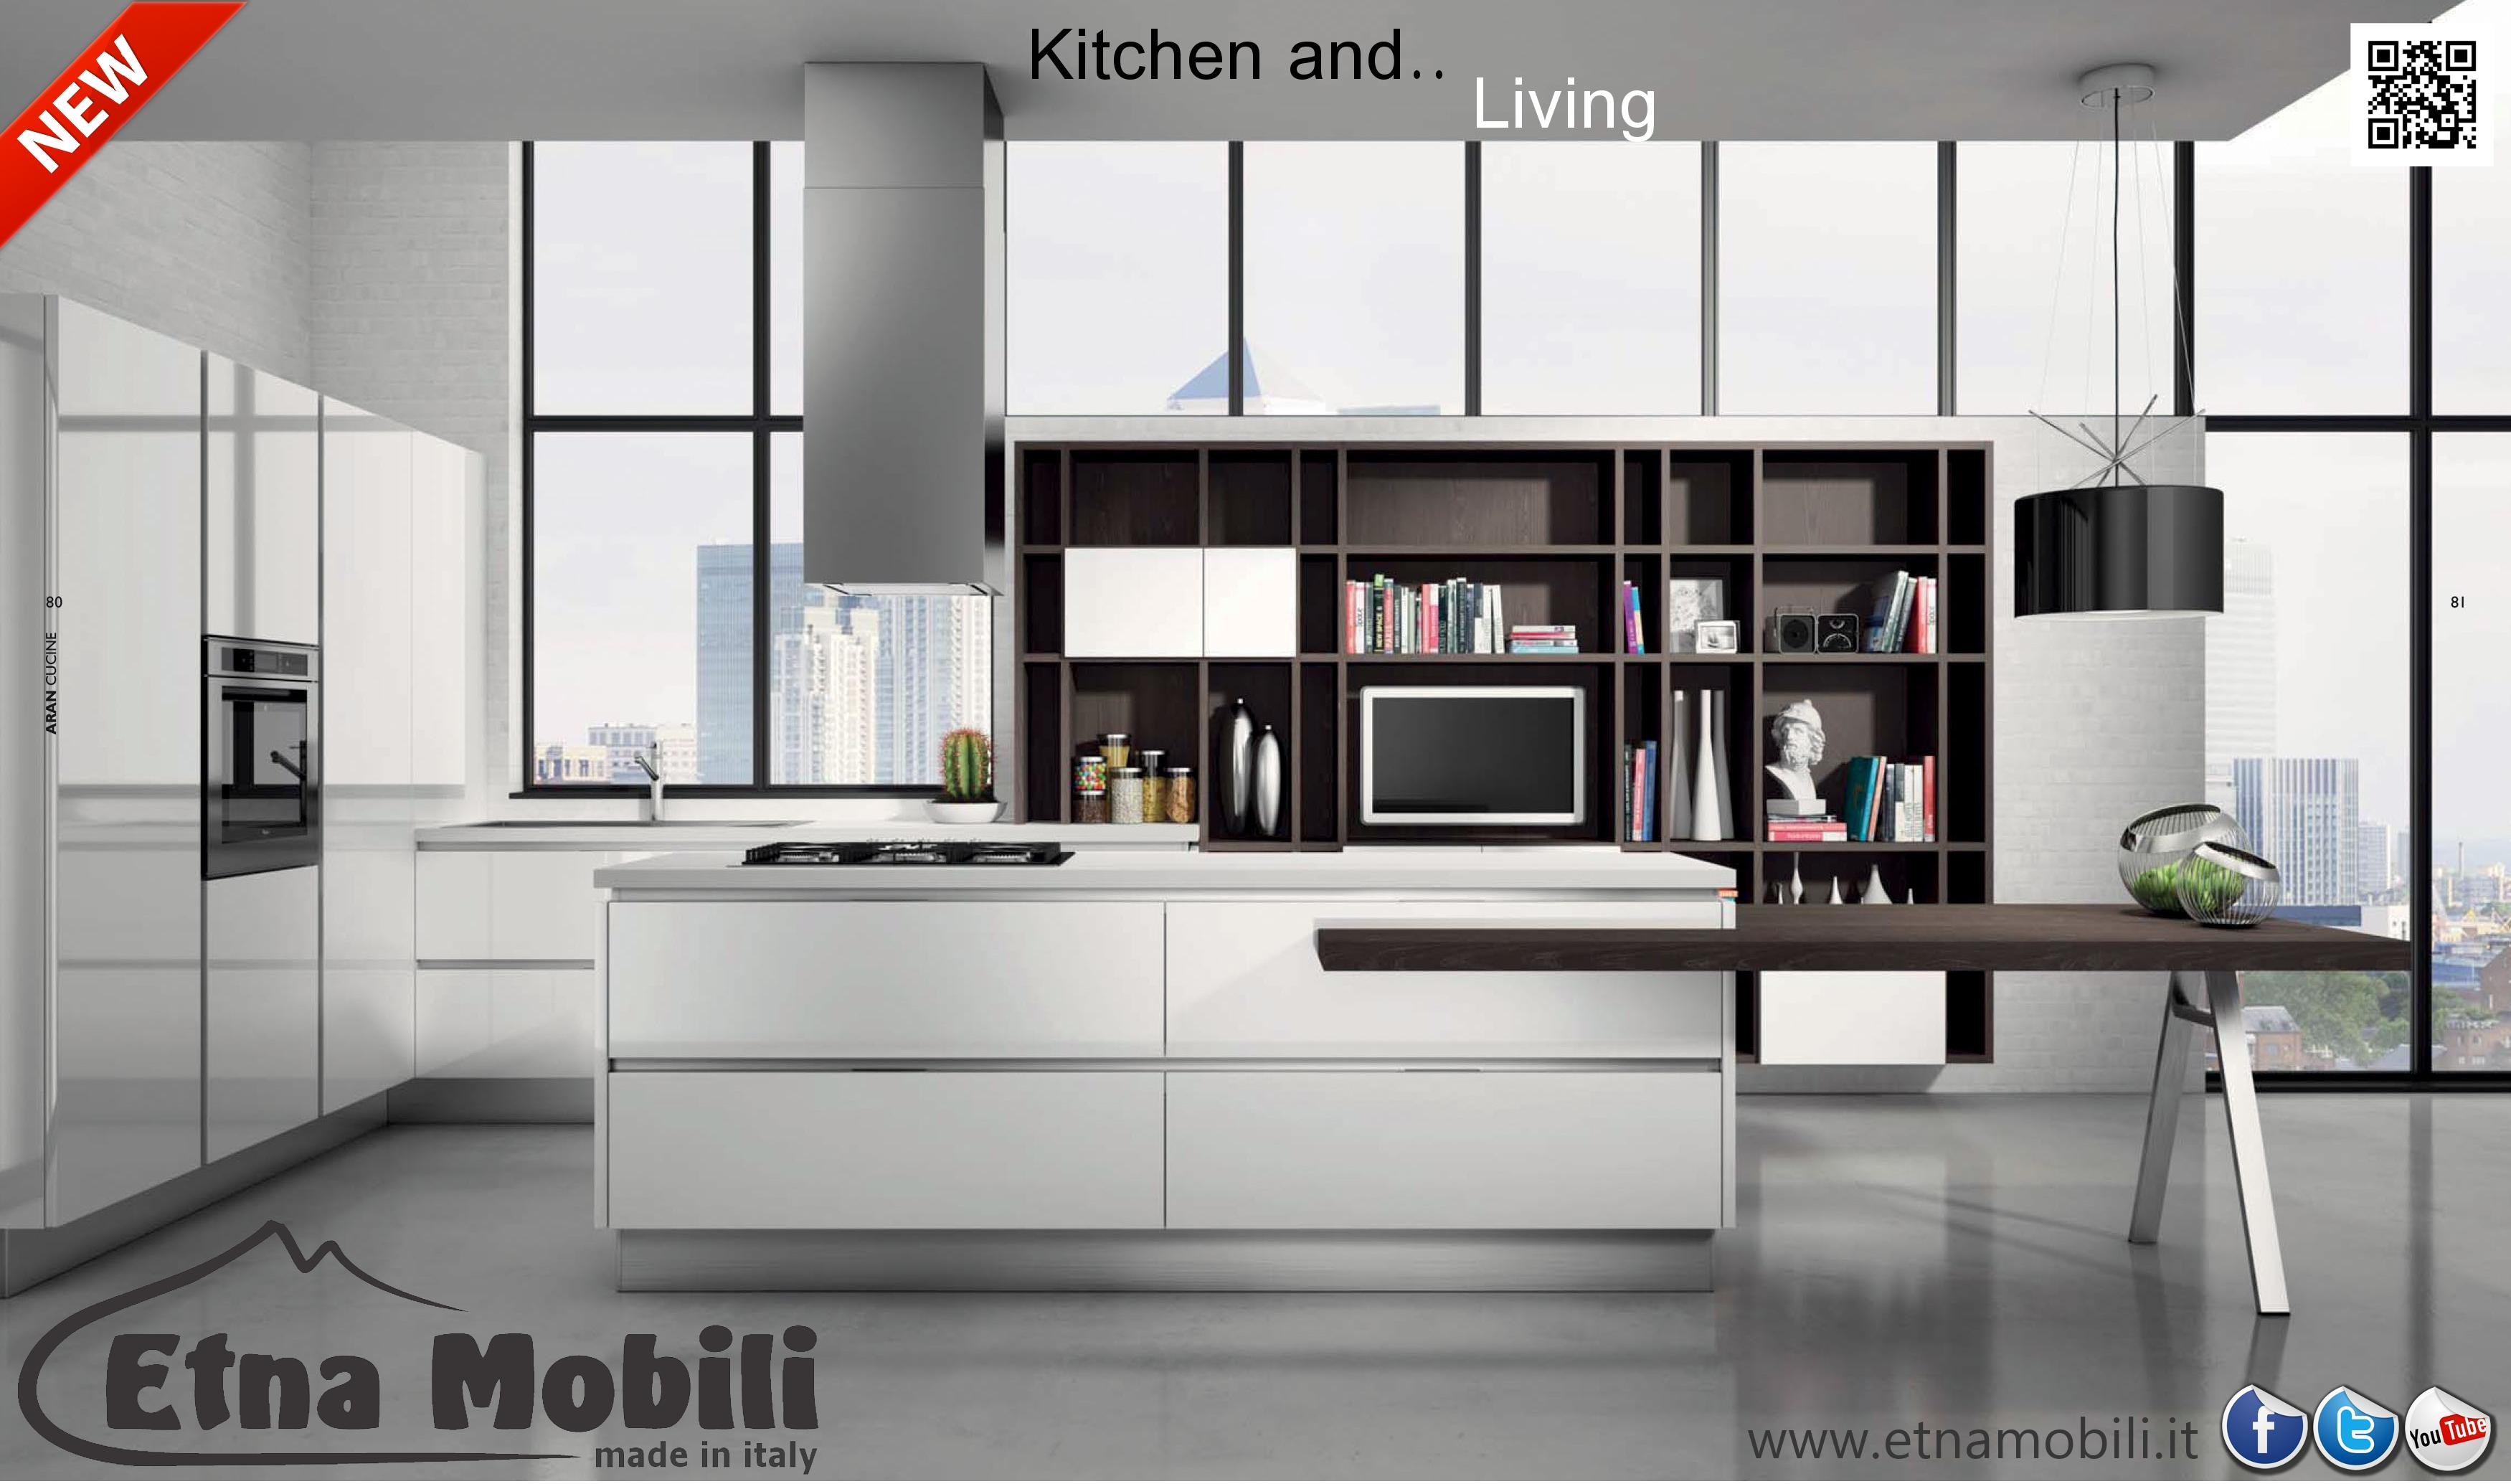 ... http://www.desainer.it/arredamento-design/cucina/cucine-con-isola.php